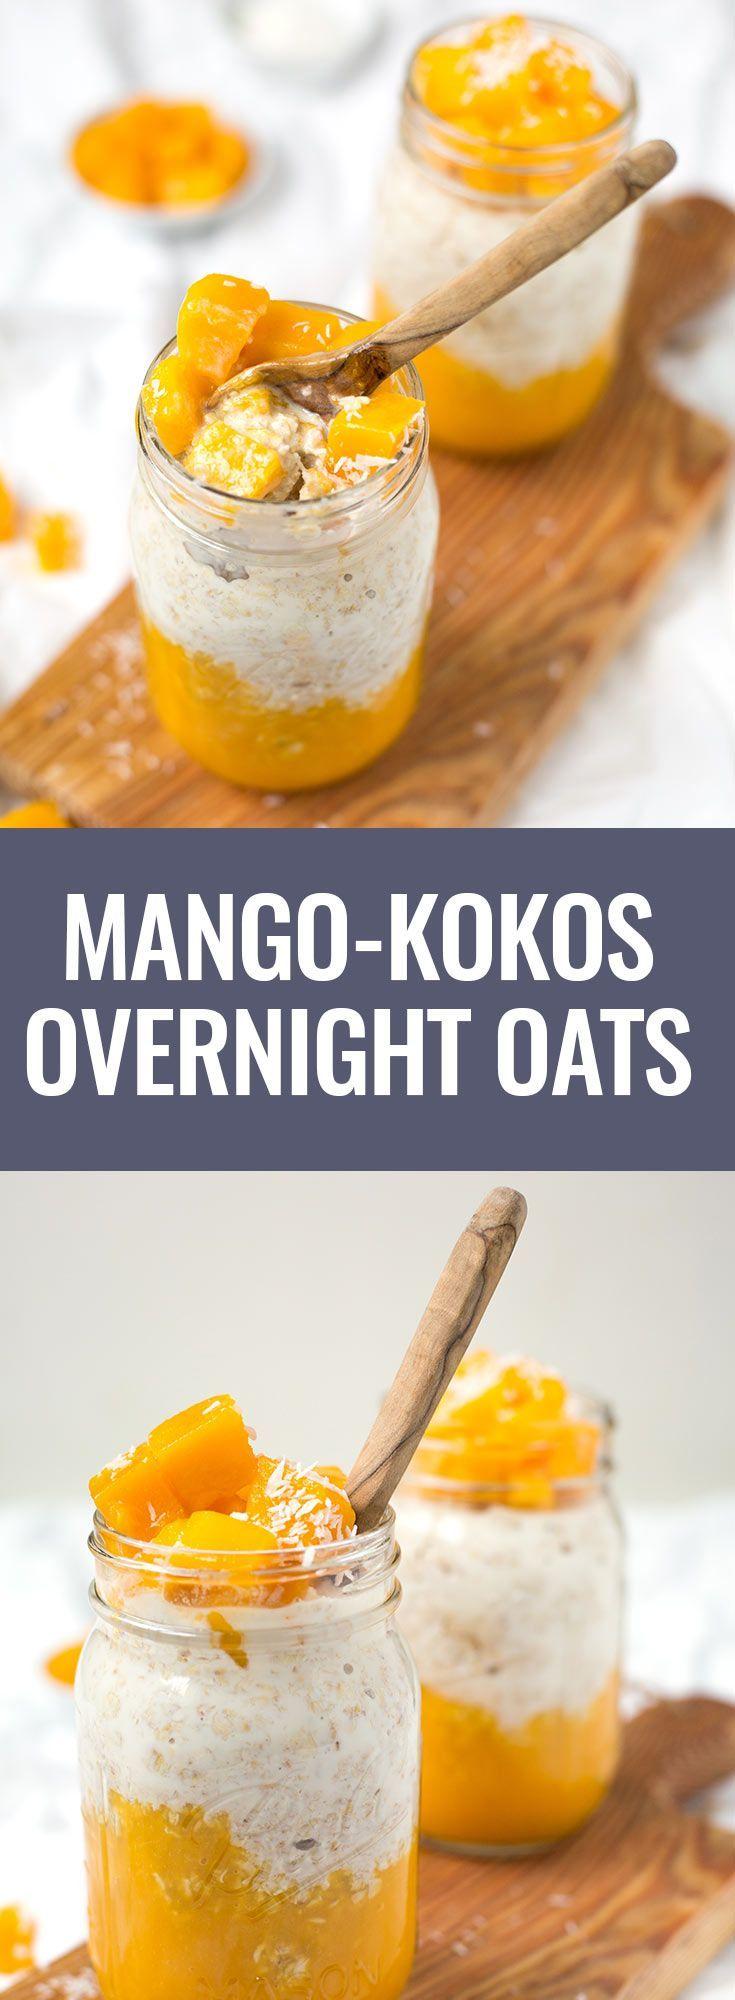 Mango Kokos Overnight Oats  Yummy